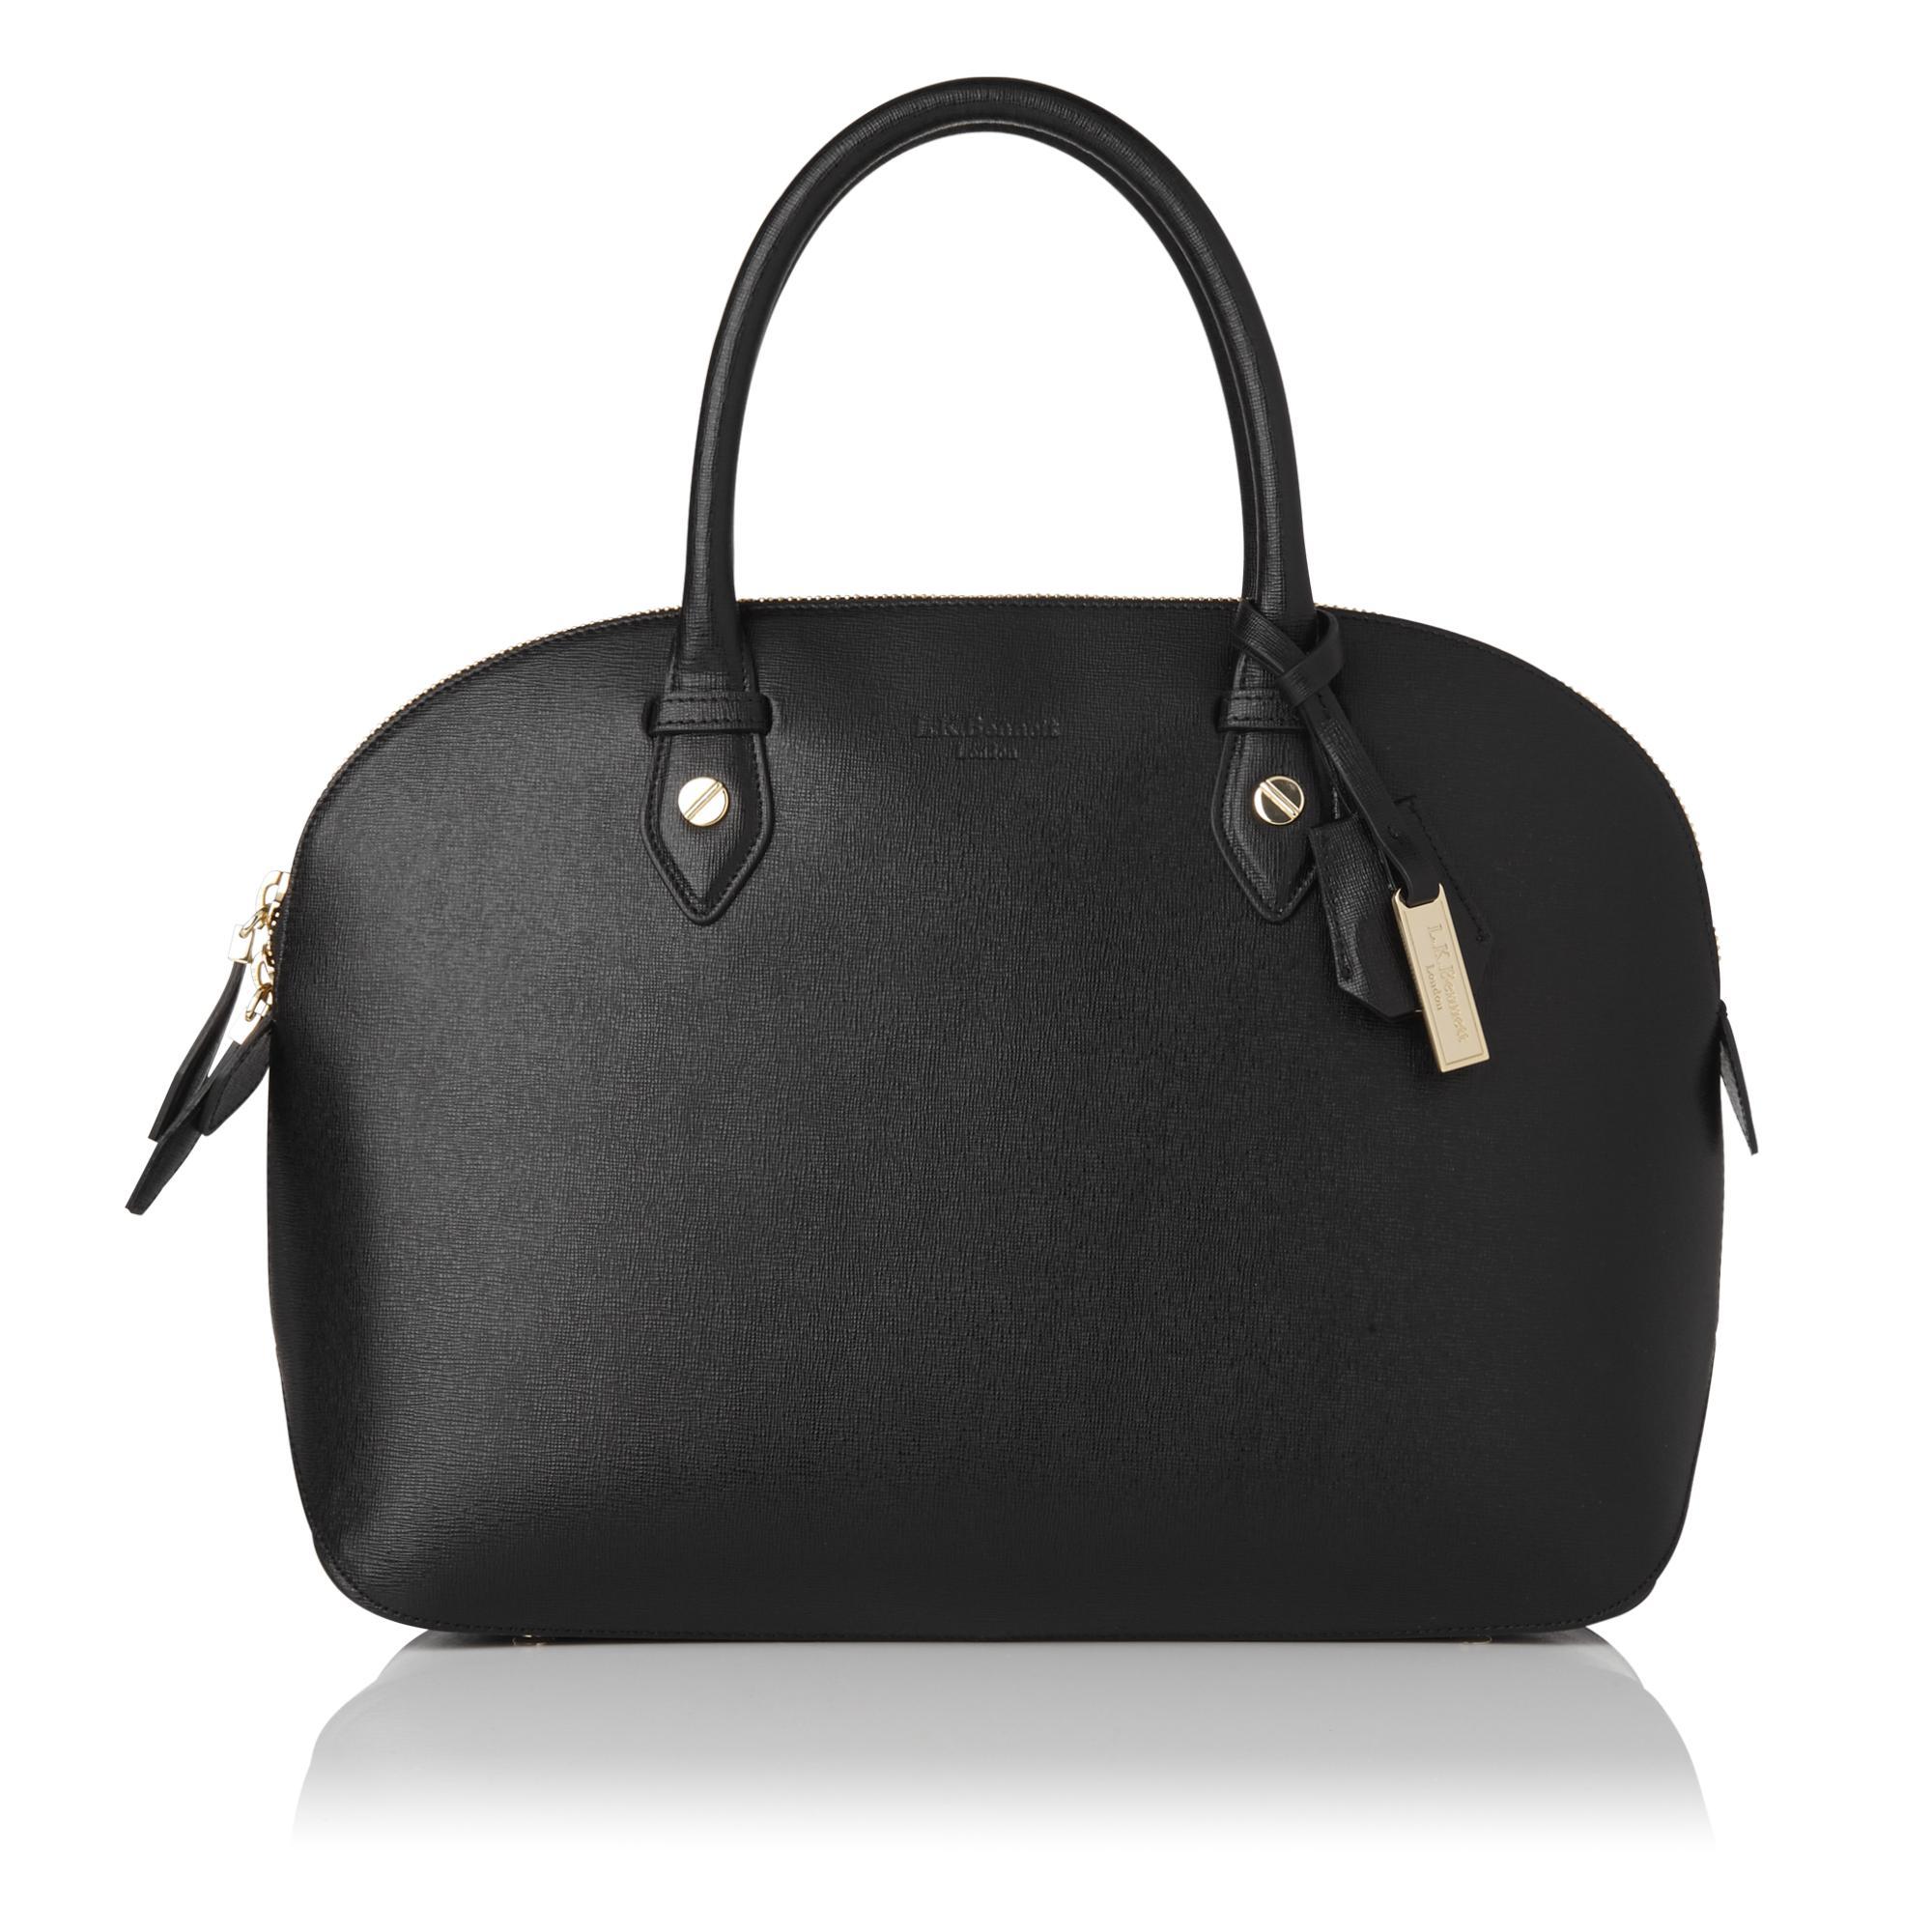 L.K.Bennett Camilla Bugatti Bag